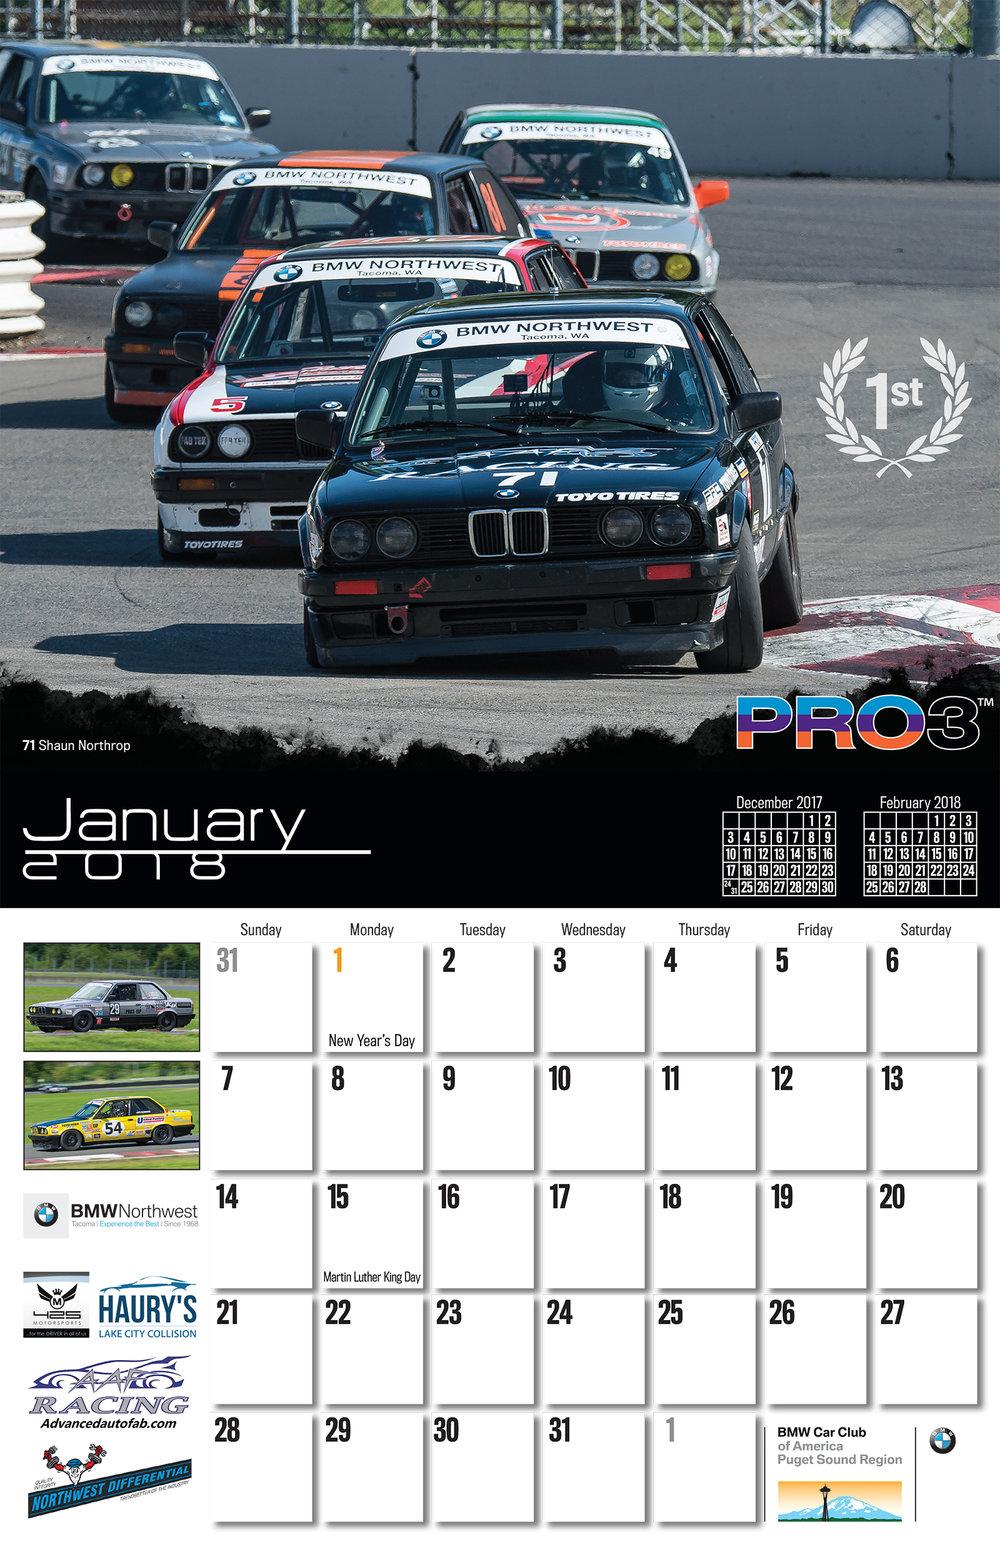 PRO3_Calendar_2018_01-Jan.jpg